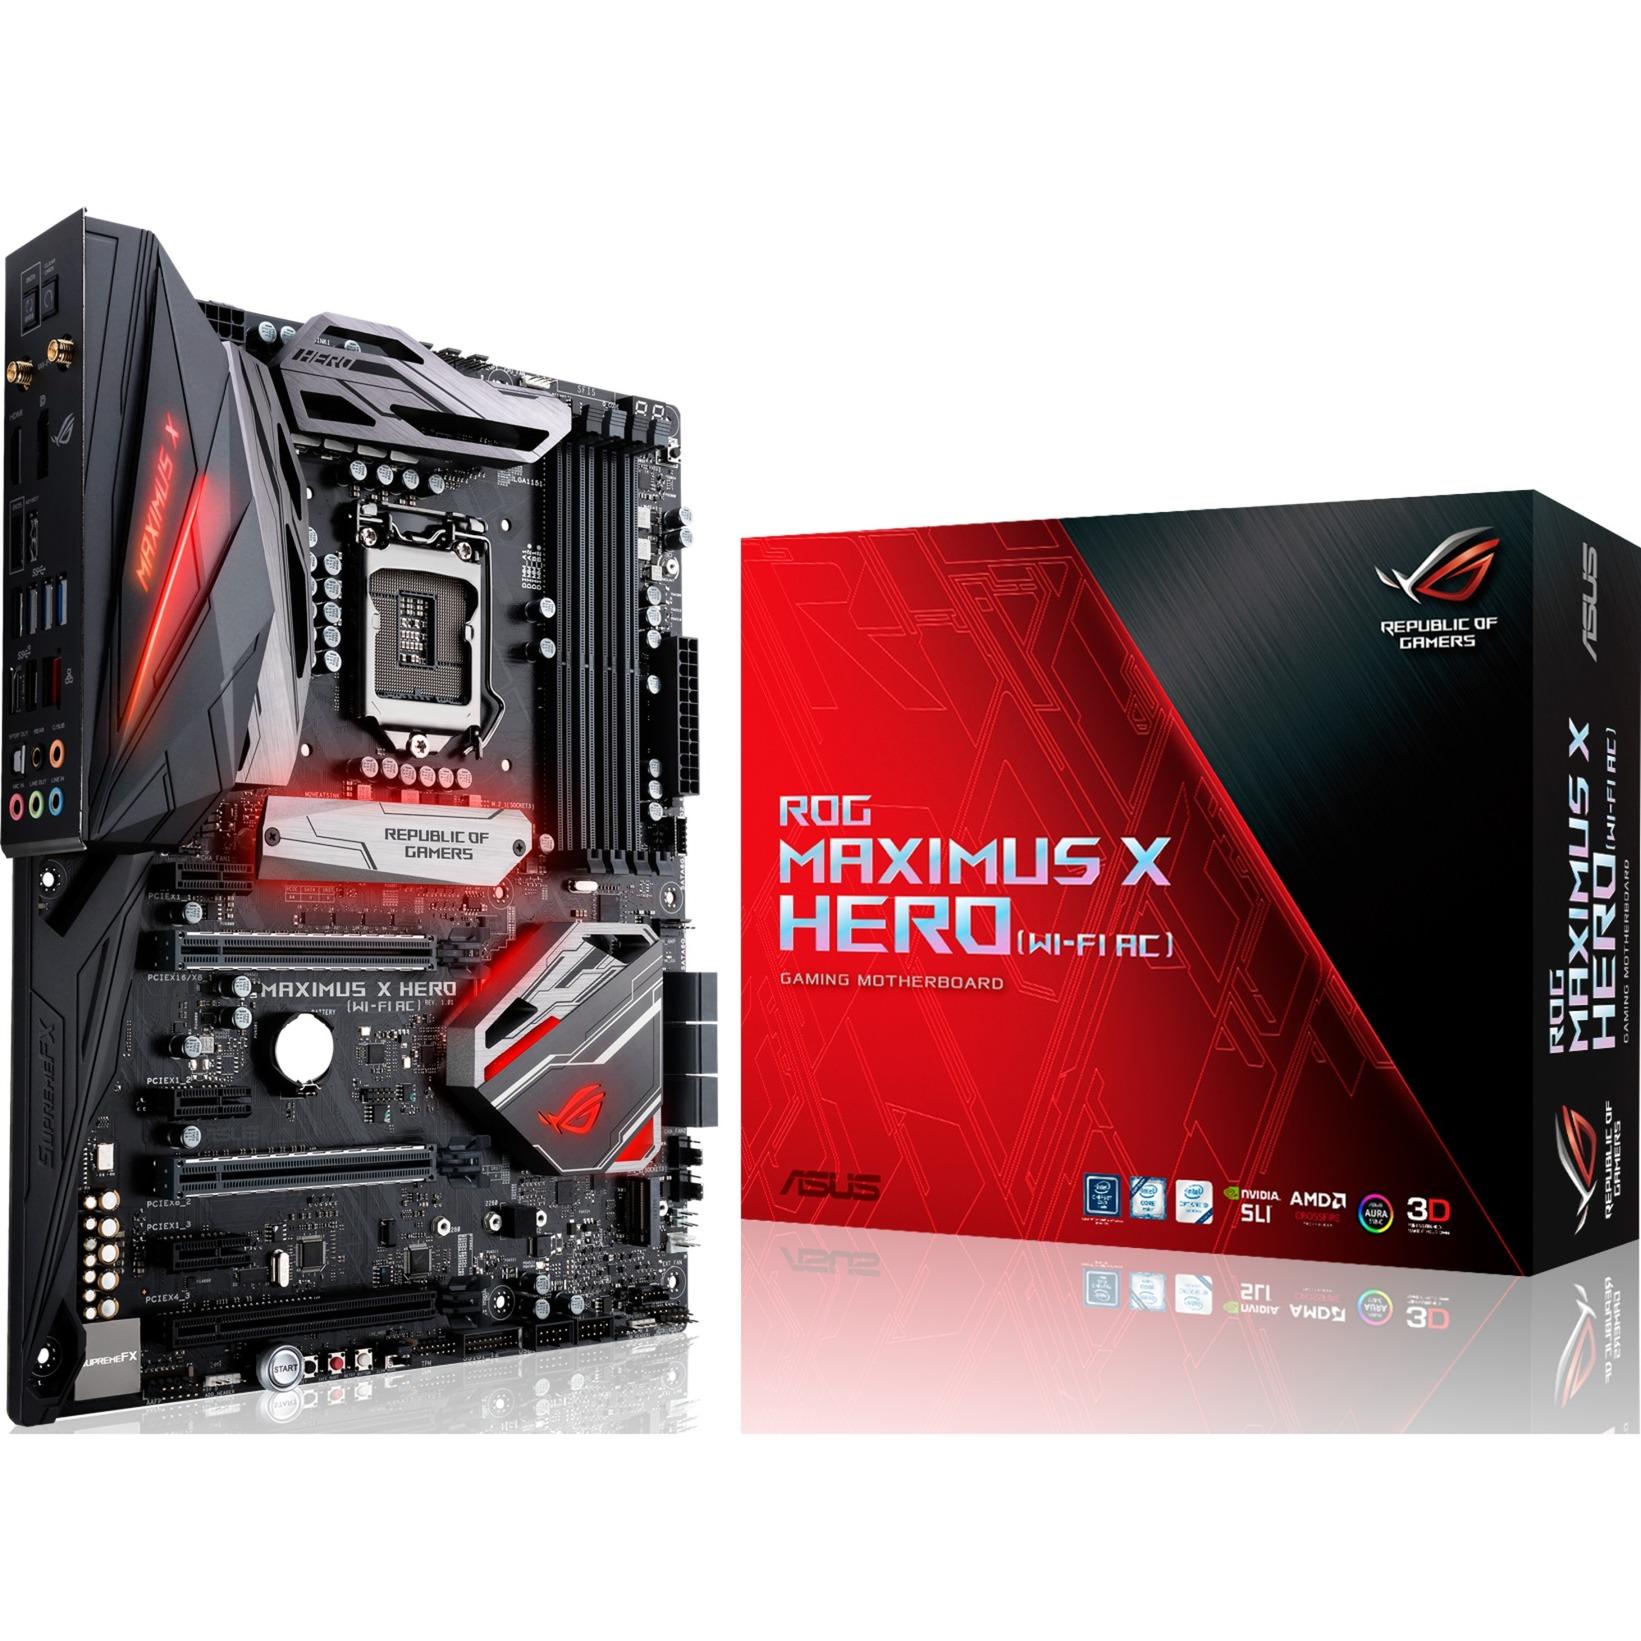 ROG MAXIMUS X HERO (WI-FI AC) LGA 1151 (Socket H4) ATX carte mère